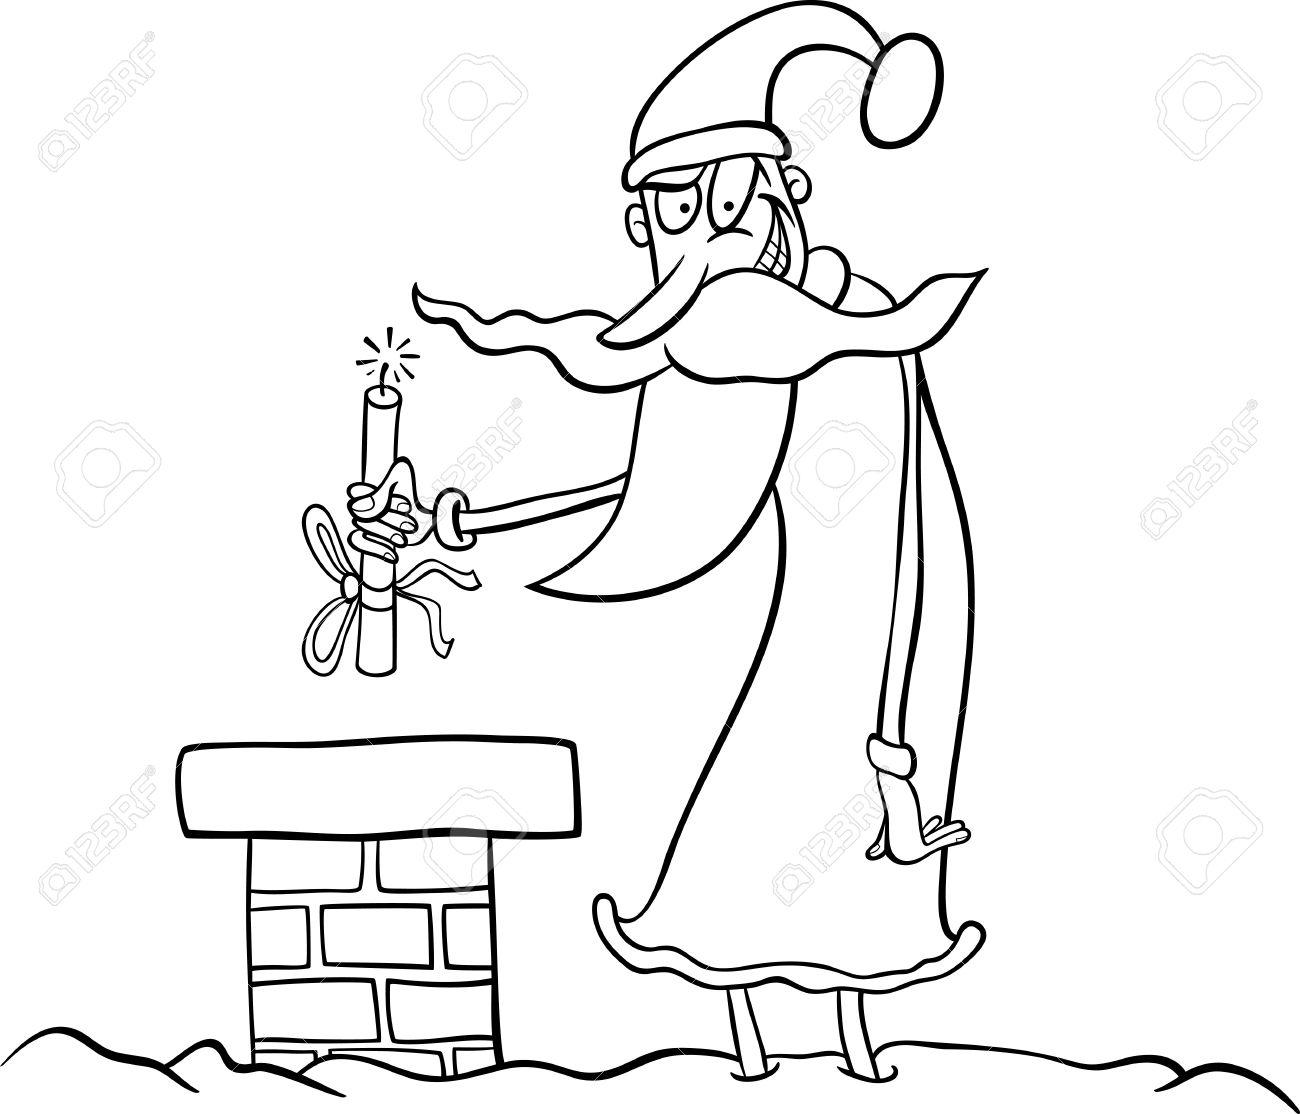 cartoon illustration of funny santa claus or papa noel on the